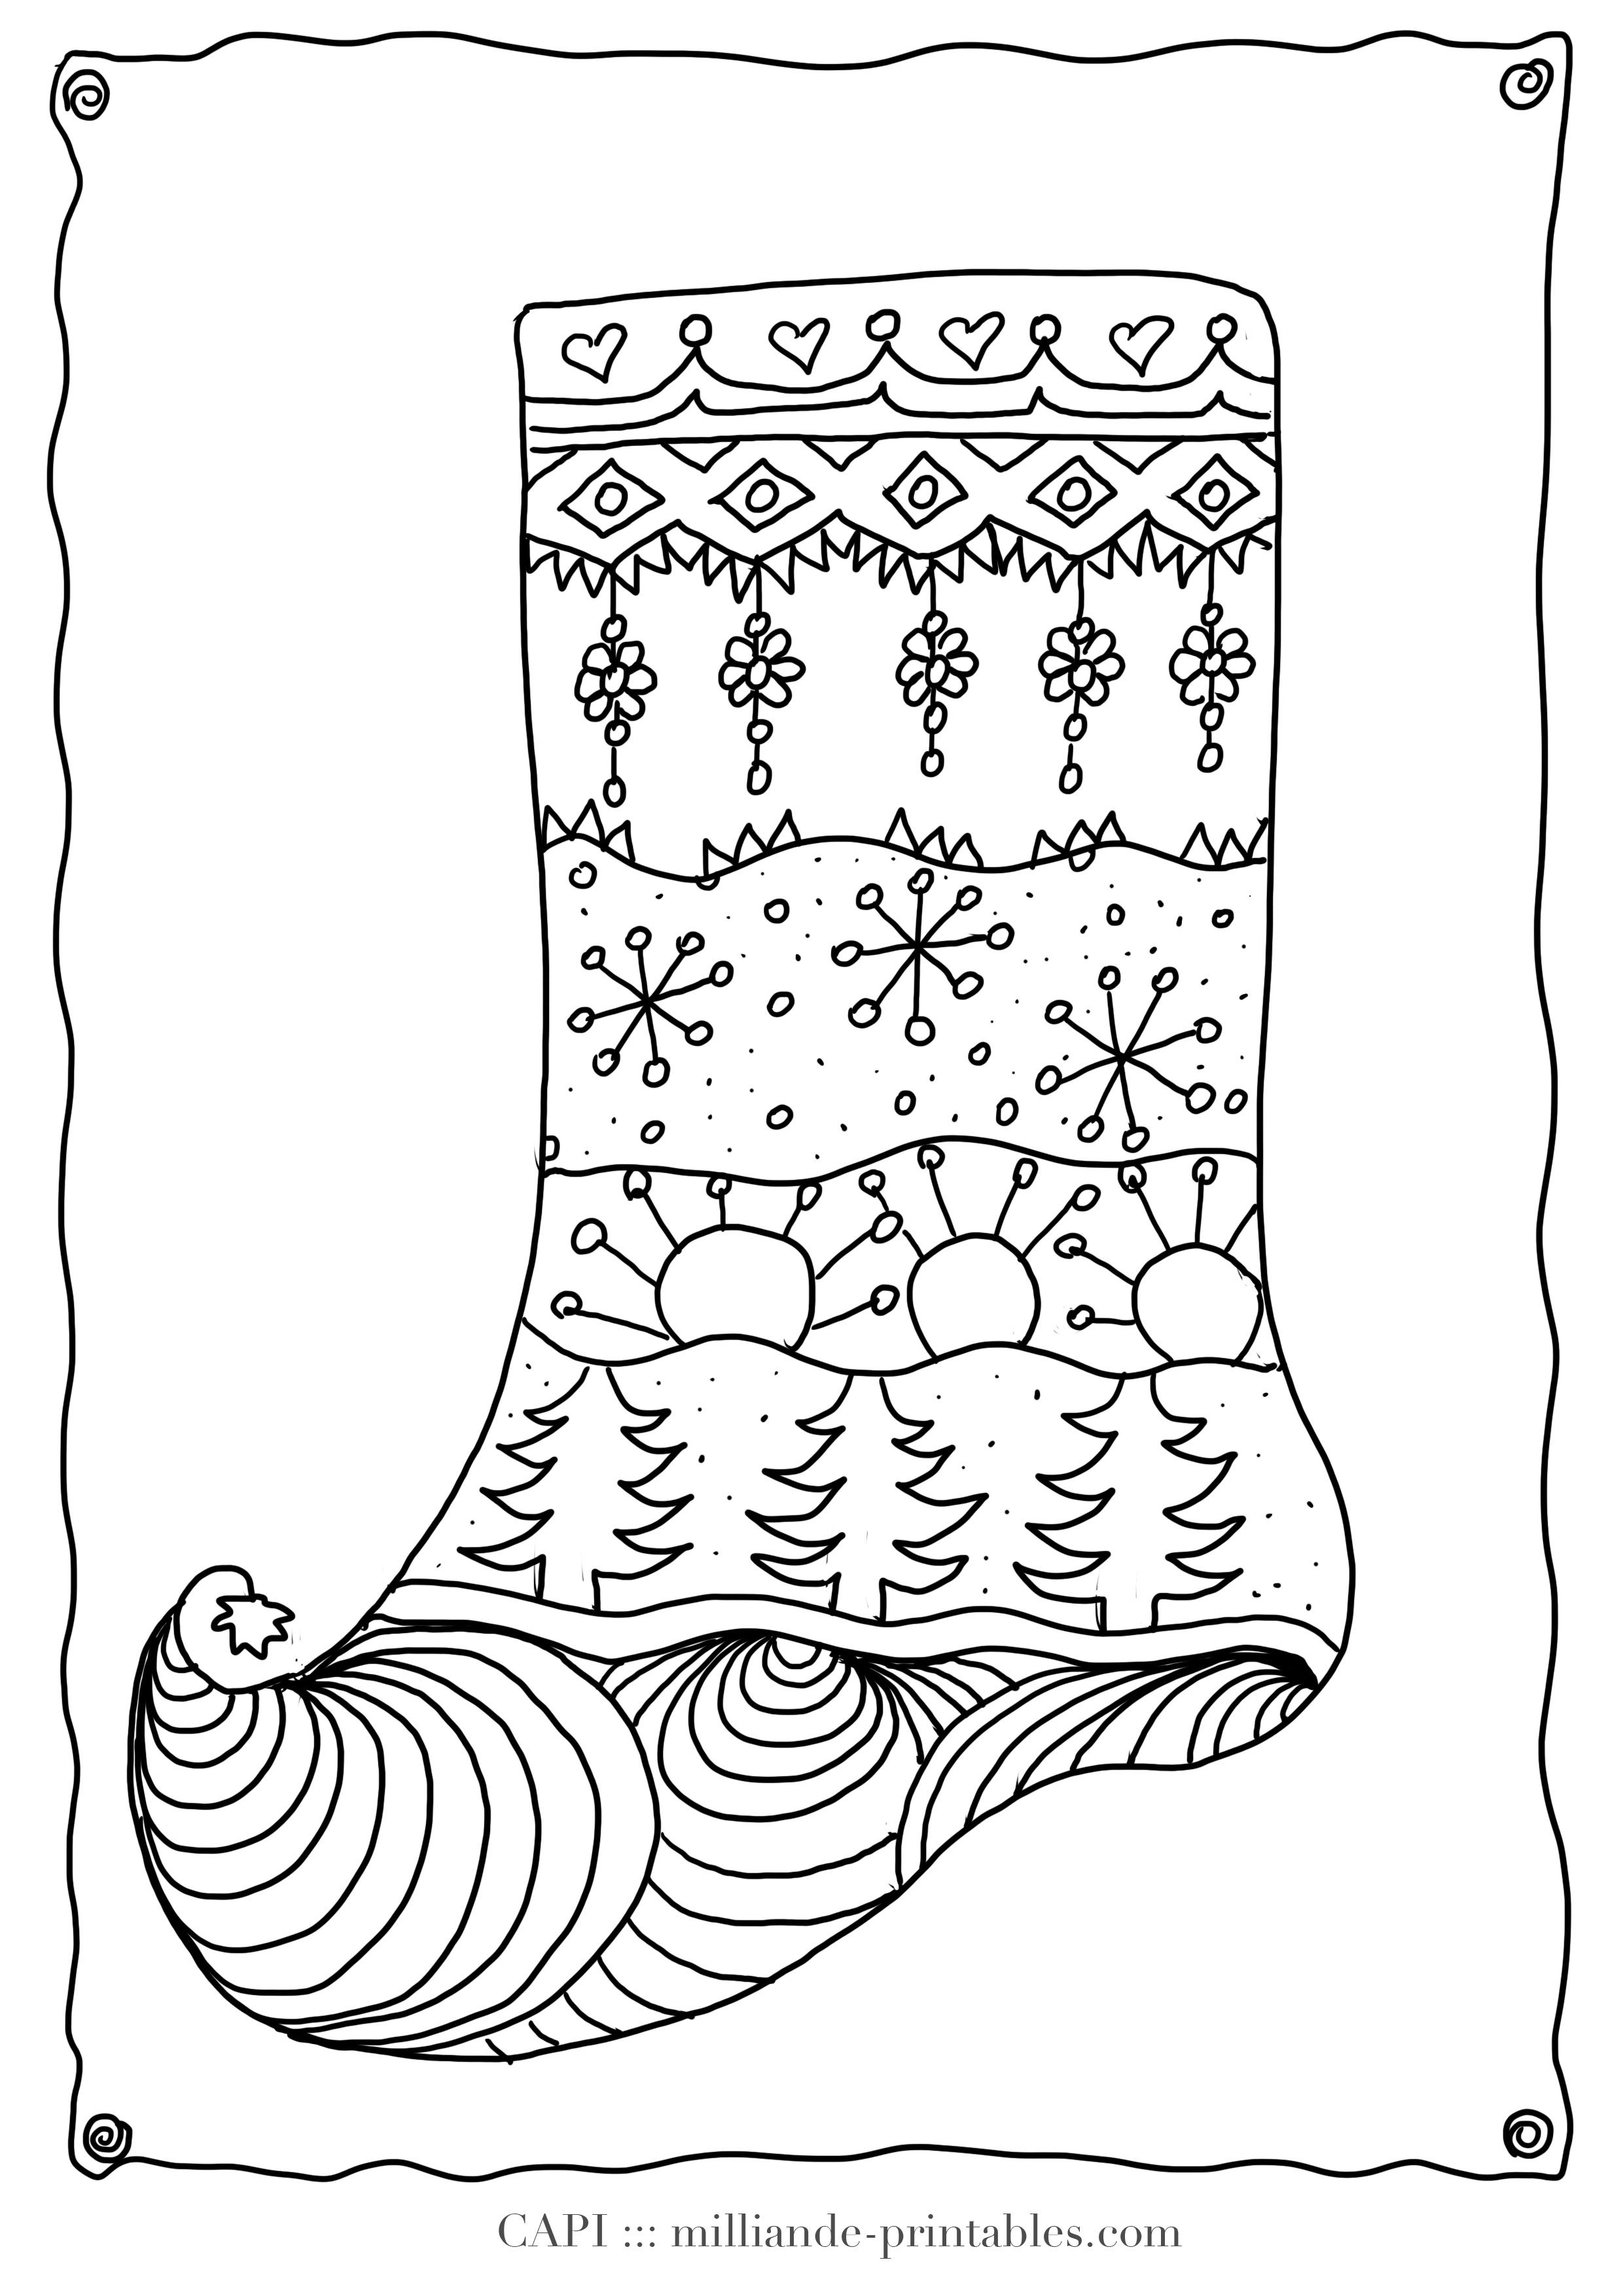 Christmas Coloring Page Stocking , Milliande\'s Original Free ...